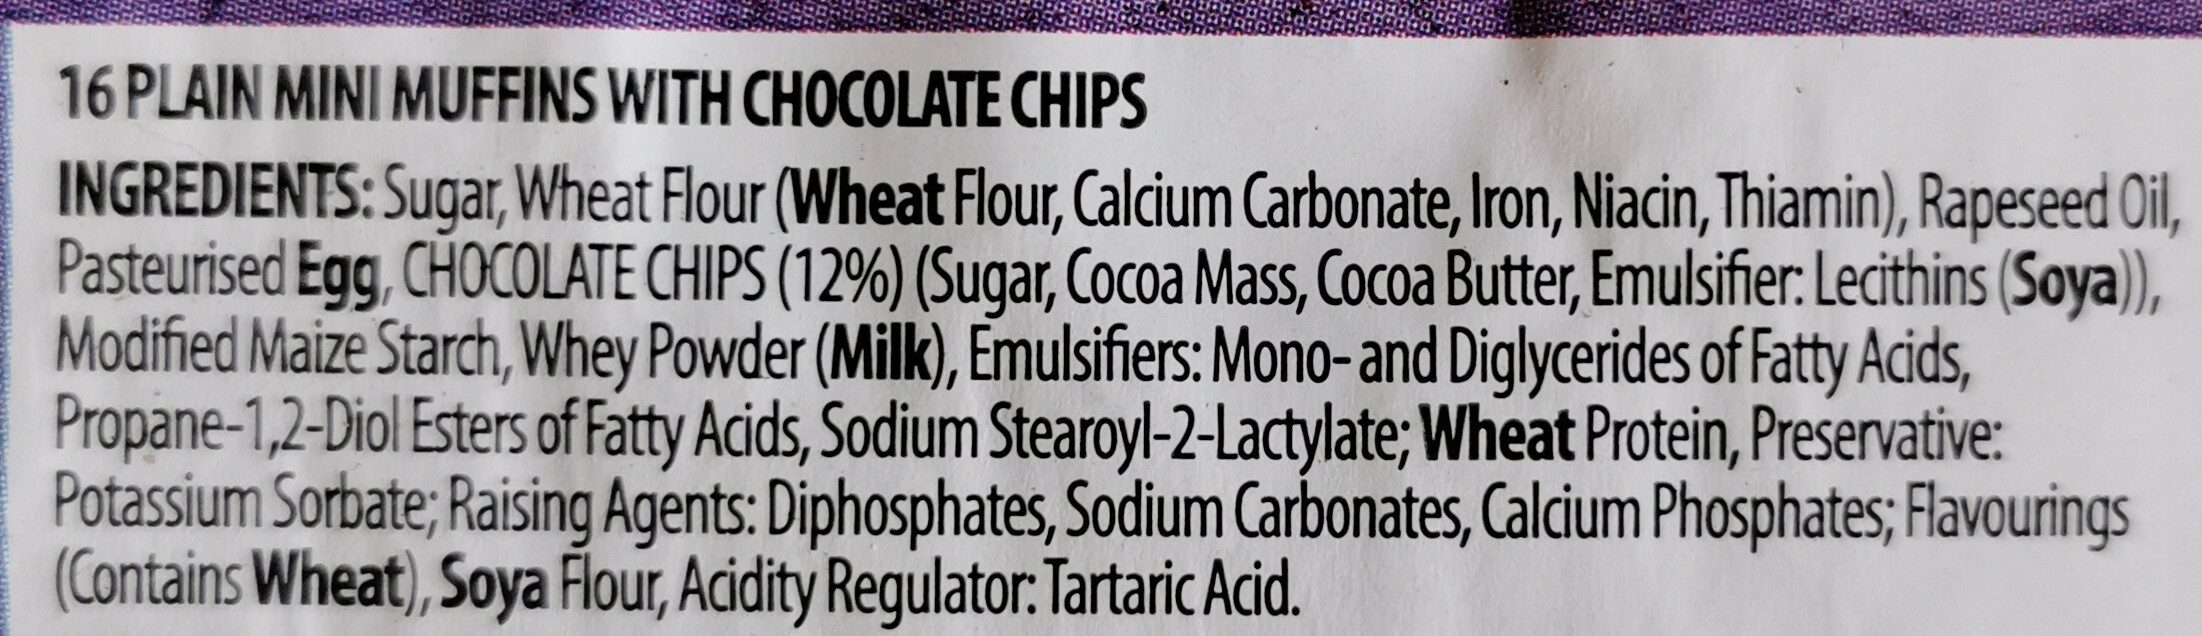 16 chocolate chip mini muffins - Ingrédients - en